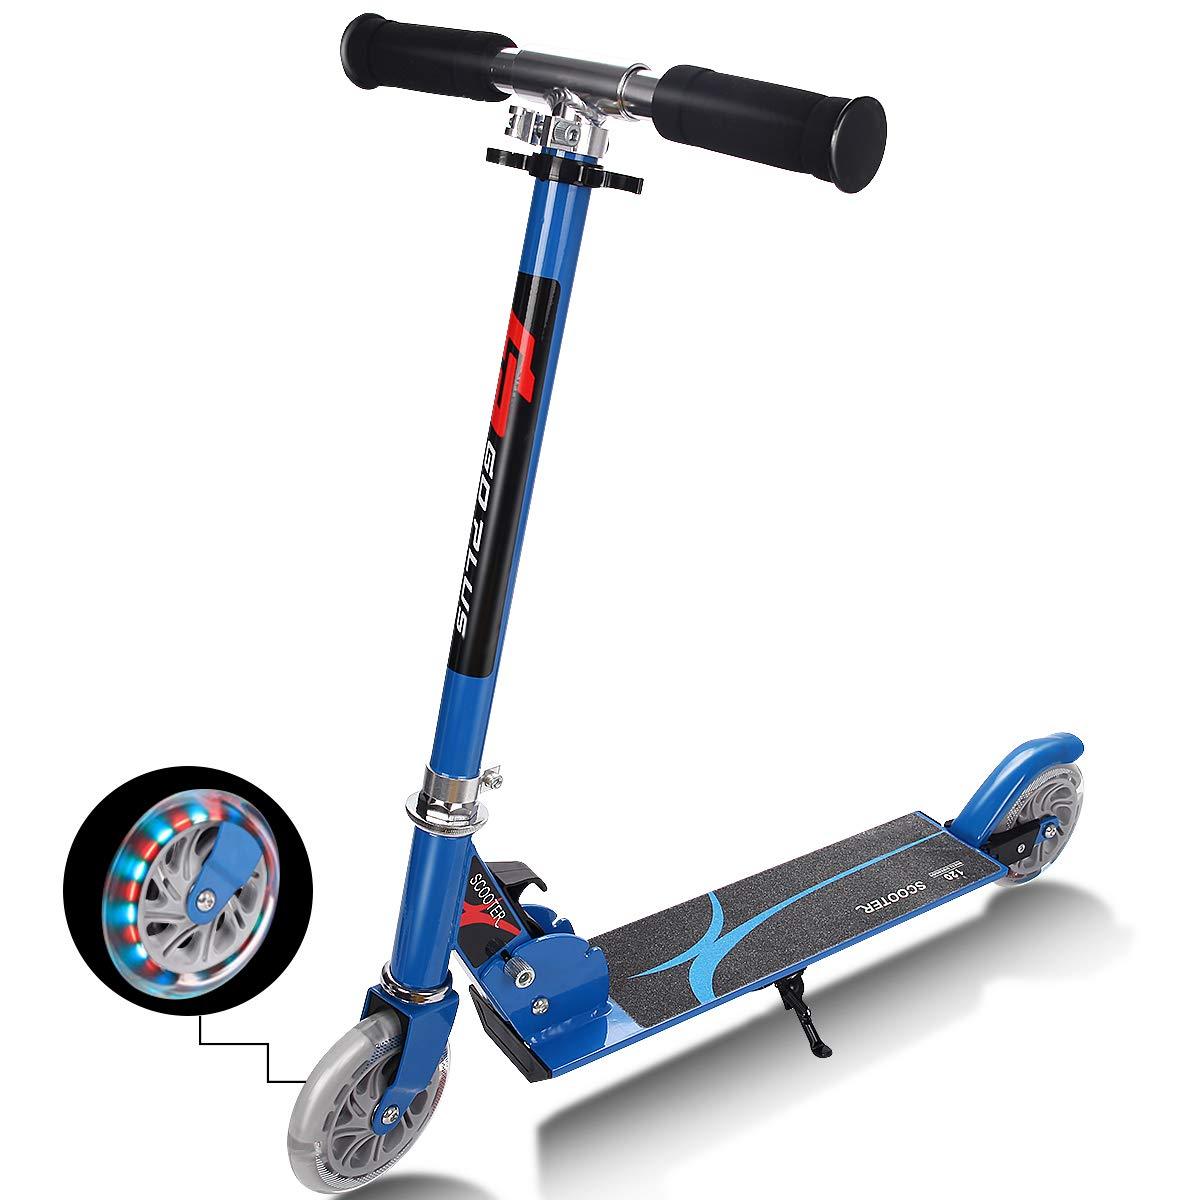 FDS Costway Scooter Roller Tretroller Kinderroller Cityroller klappbar Big Wheel höhenverstellbar mit 2 Blinkenden Räder Farbwahl